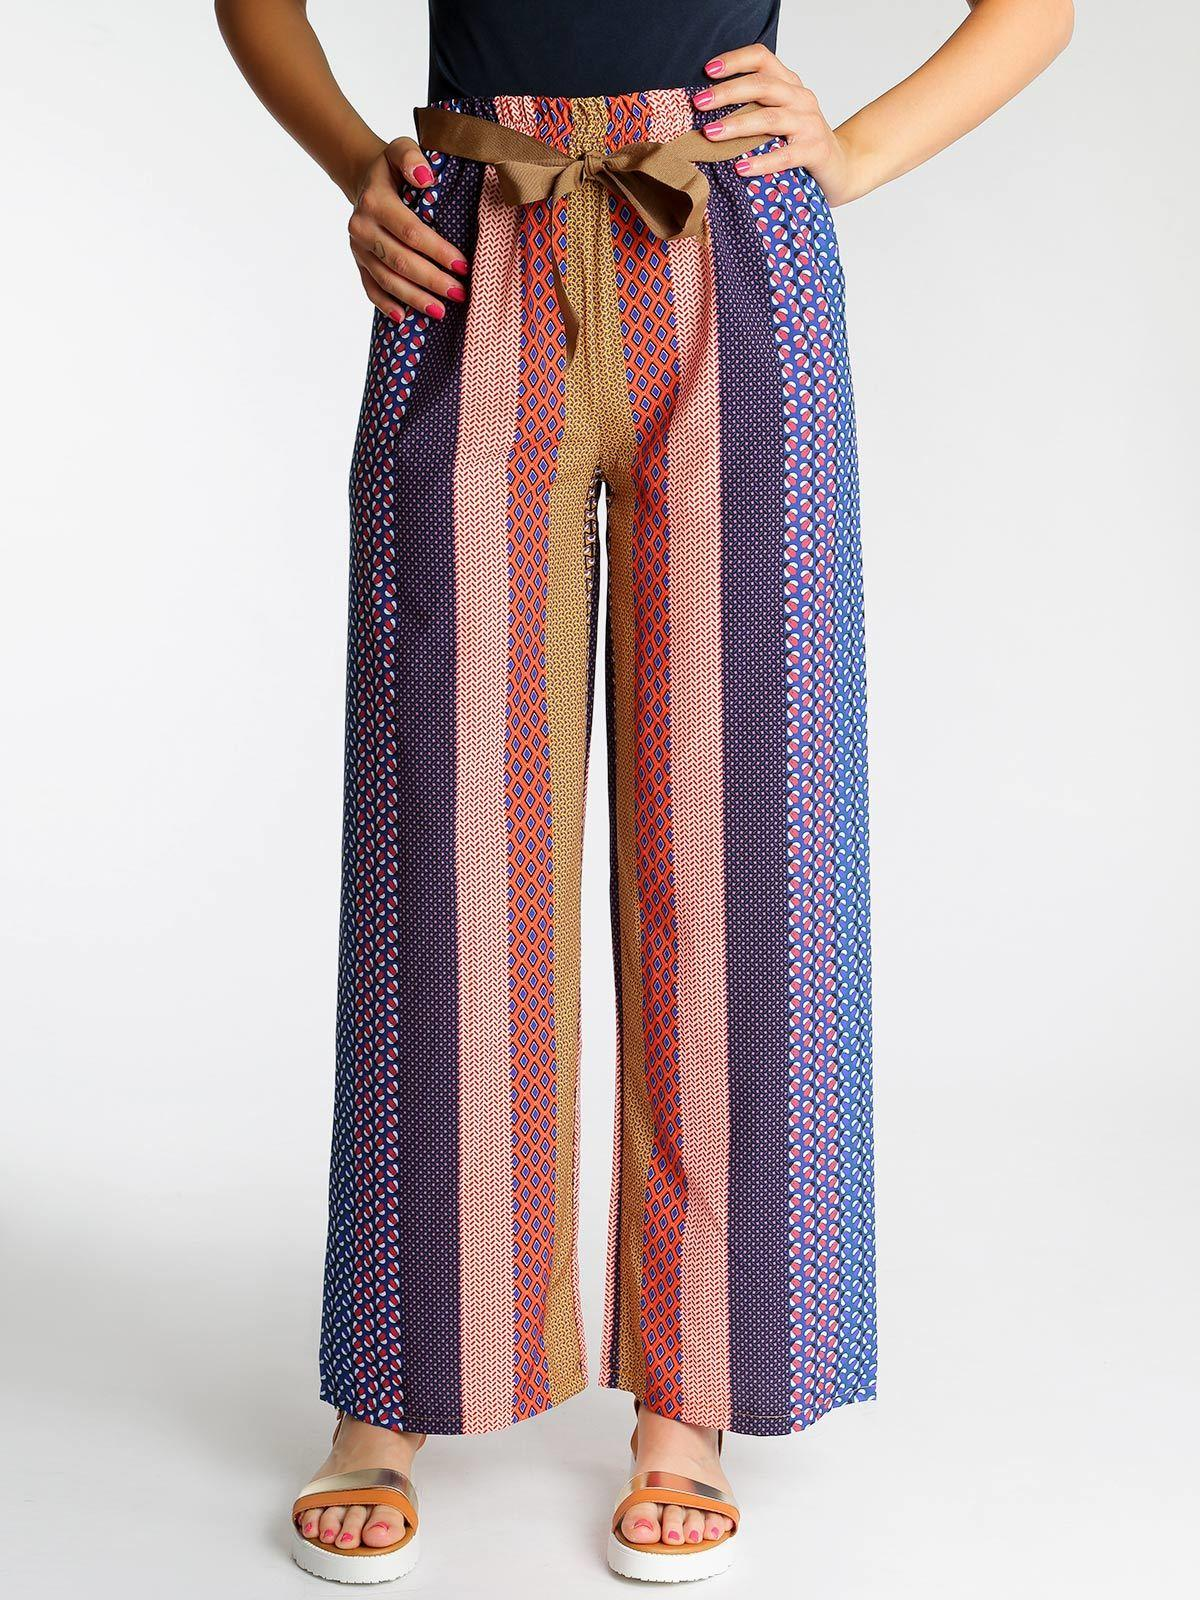 nuovo di zecca 43714 714e2 Pantaloni larghi a vita alta solada | MecShopping